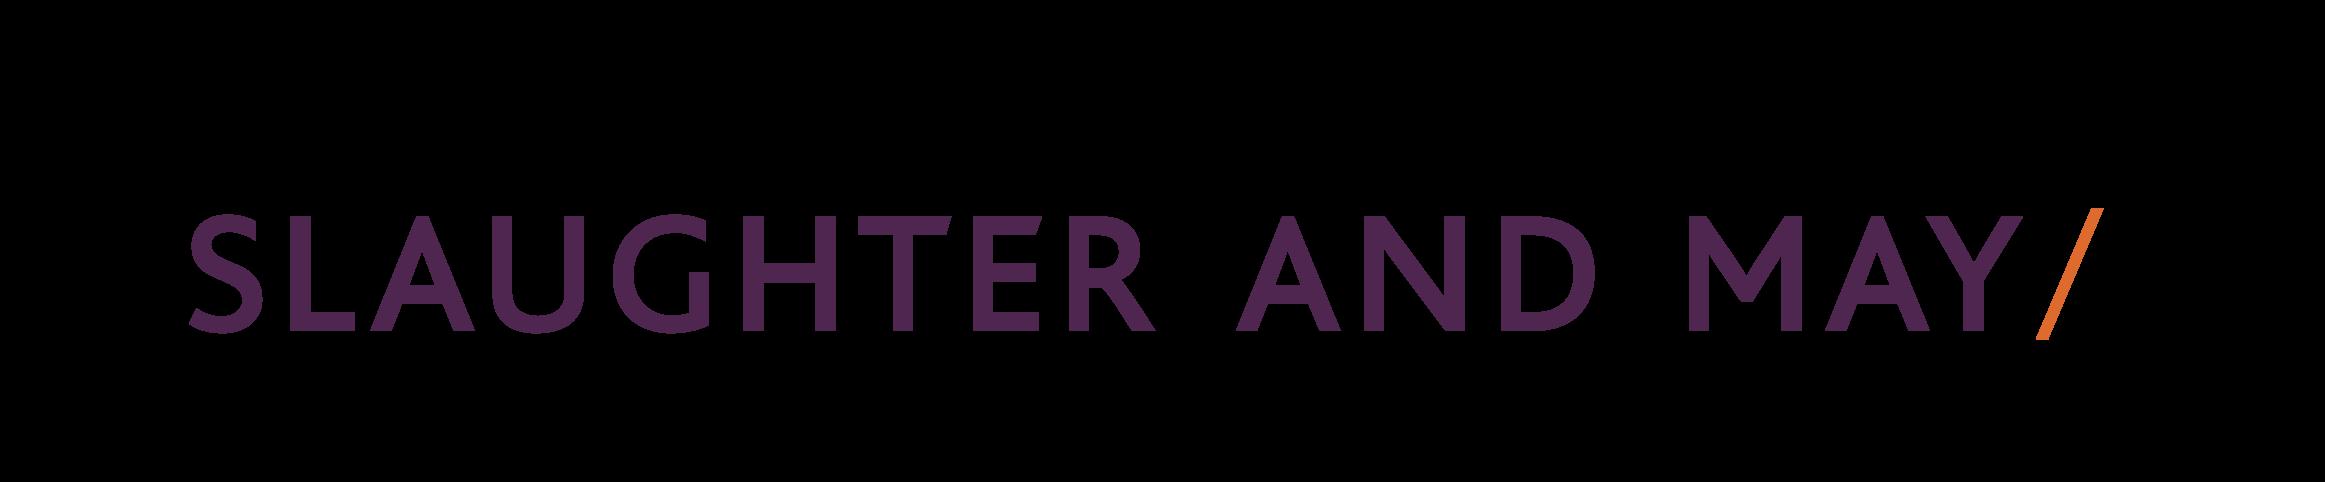 SM New Brand logo